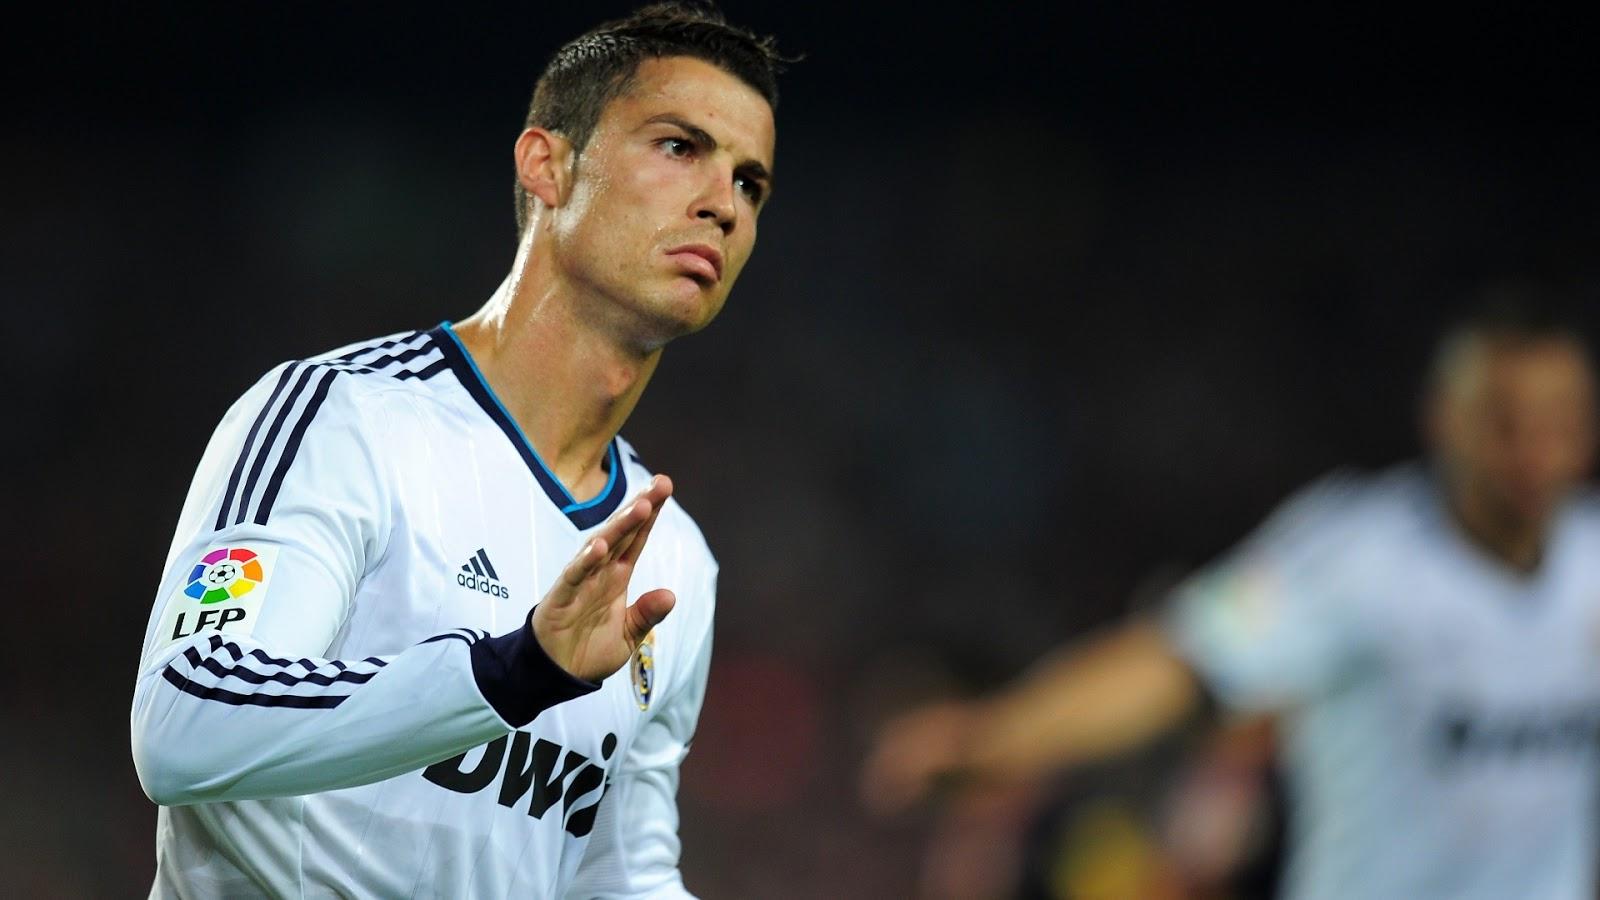 Cristiano Ronaldo Original HD Wallpapers 2013 -Real Madrid-